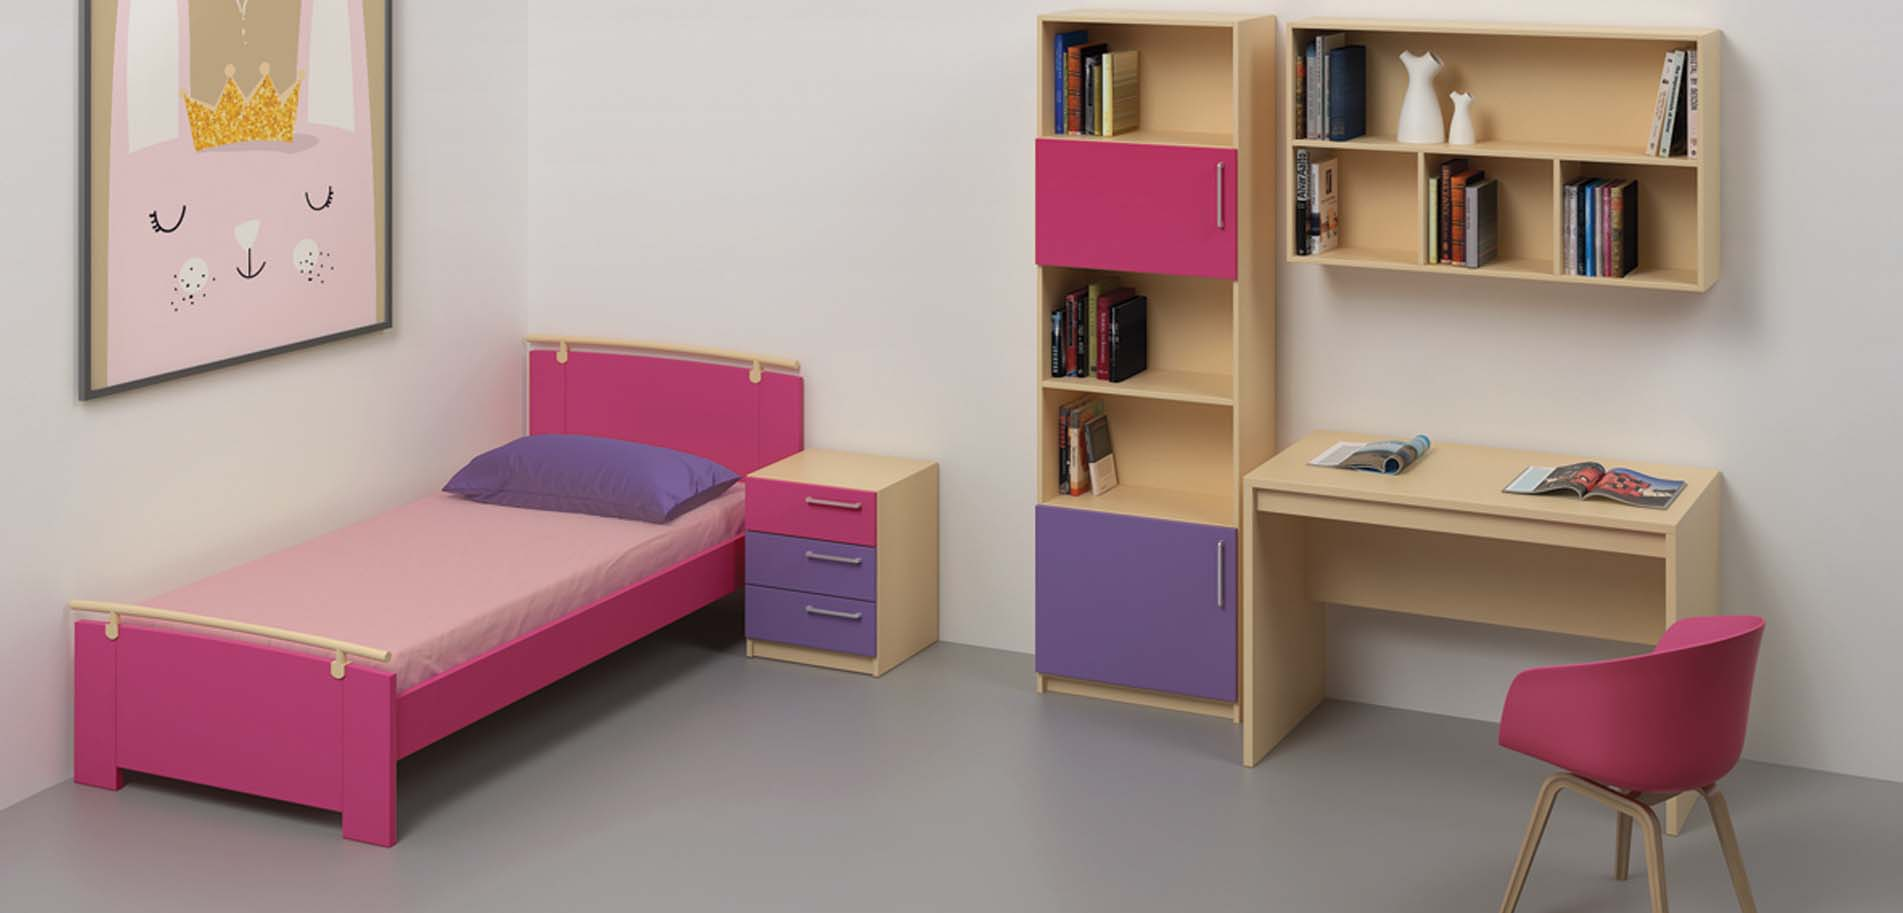 nickdawsons children bespoke lego s childrens storage beds custom bed